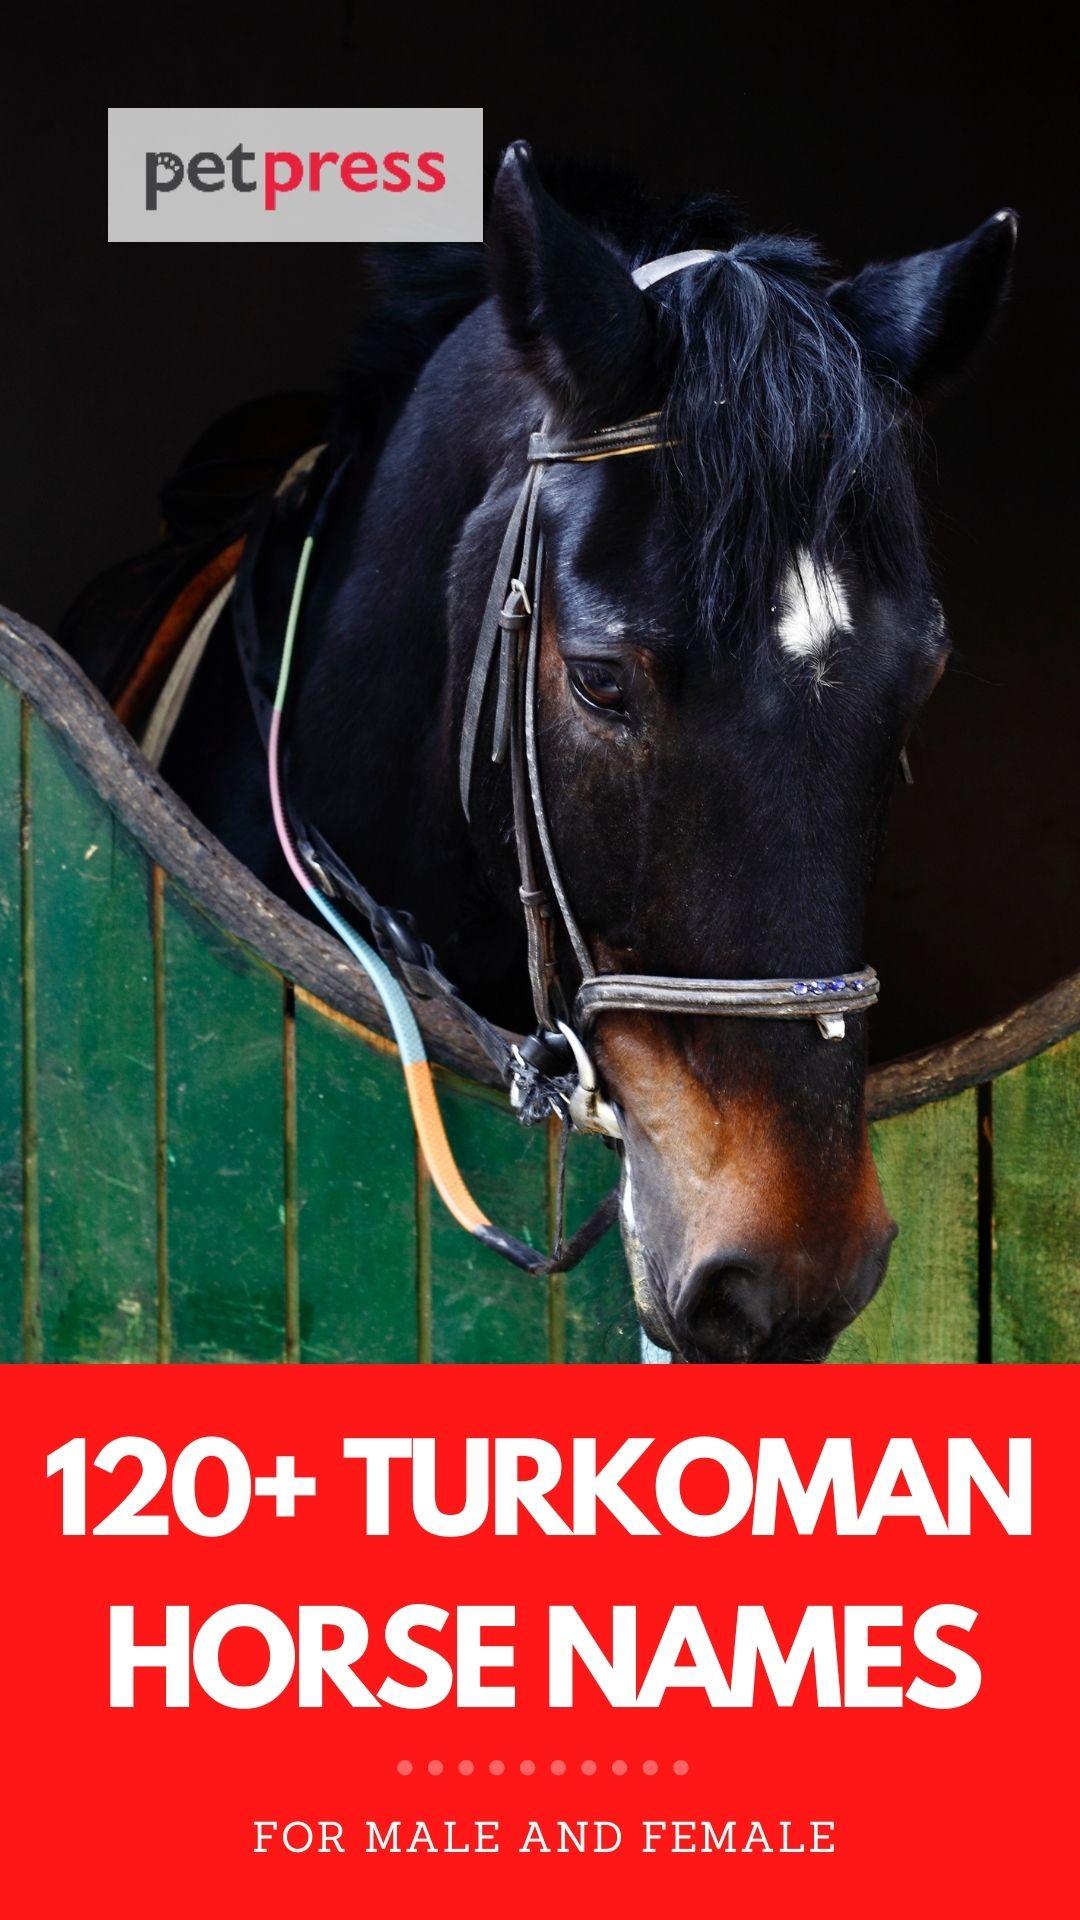 turkoman horse names